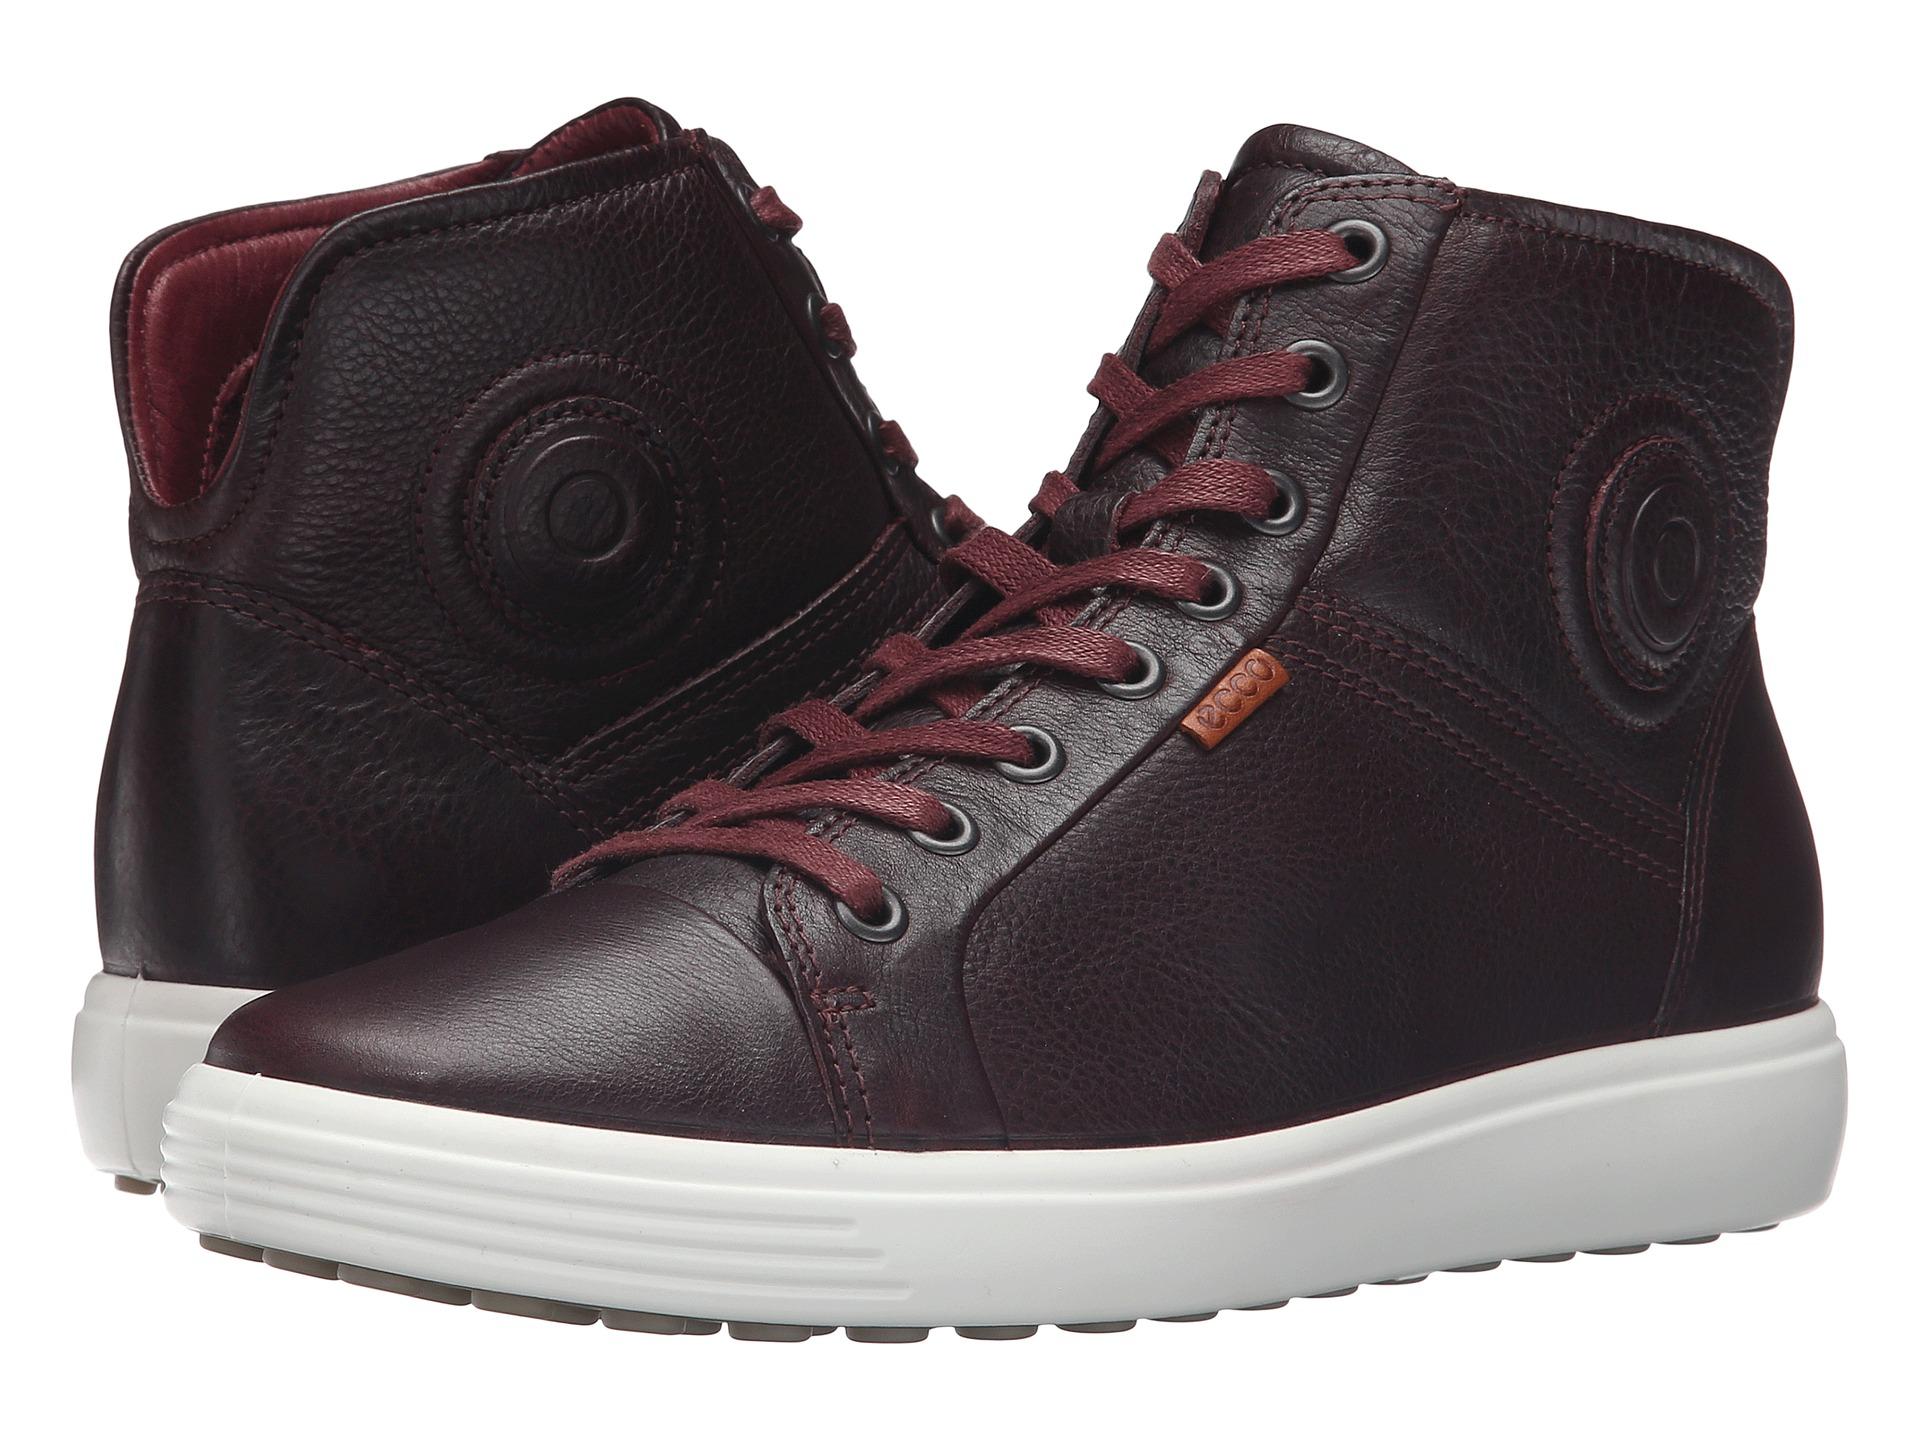 Ecco Soft Vii High Top Shoes